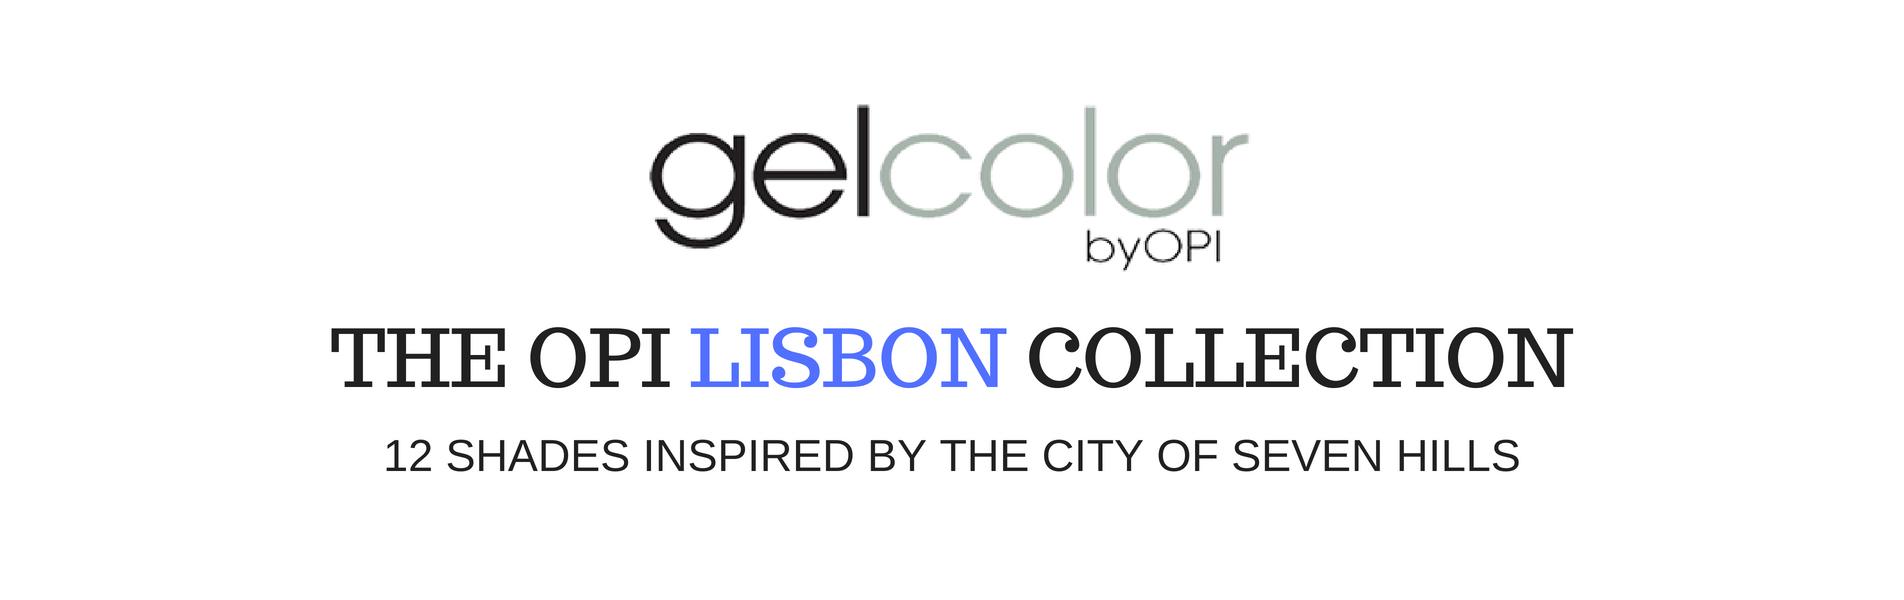 lisbon collection opi